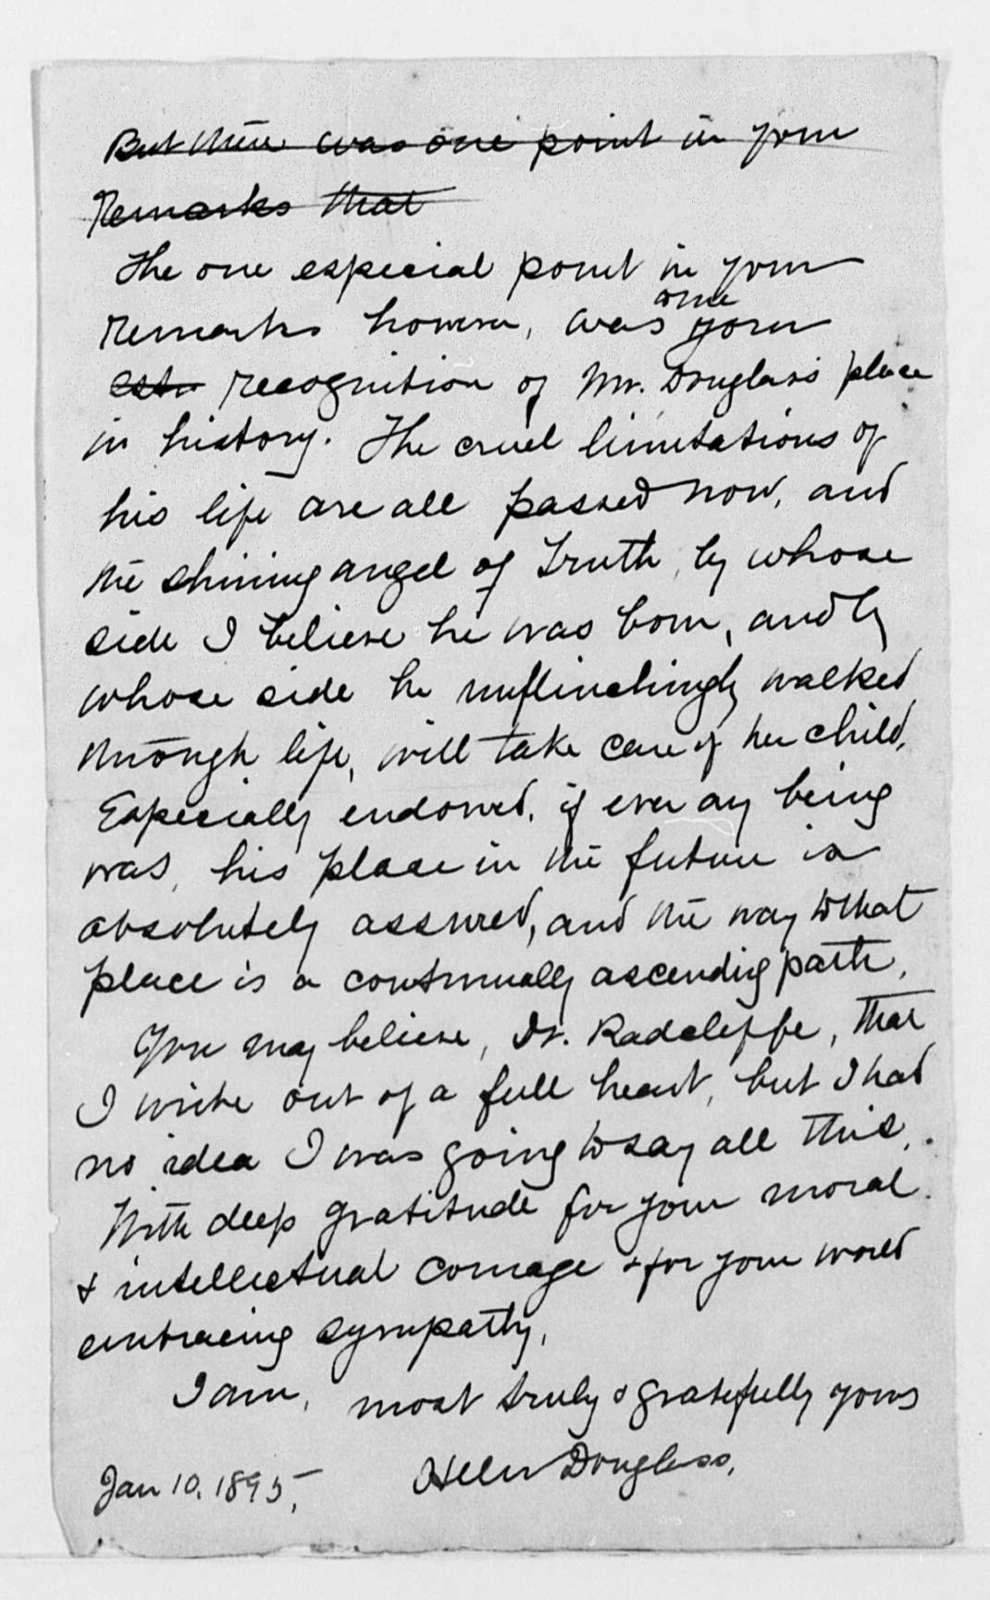 1895, Jan. - Feb. 20